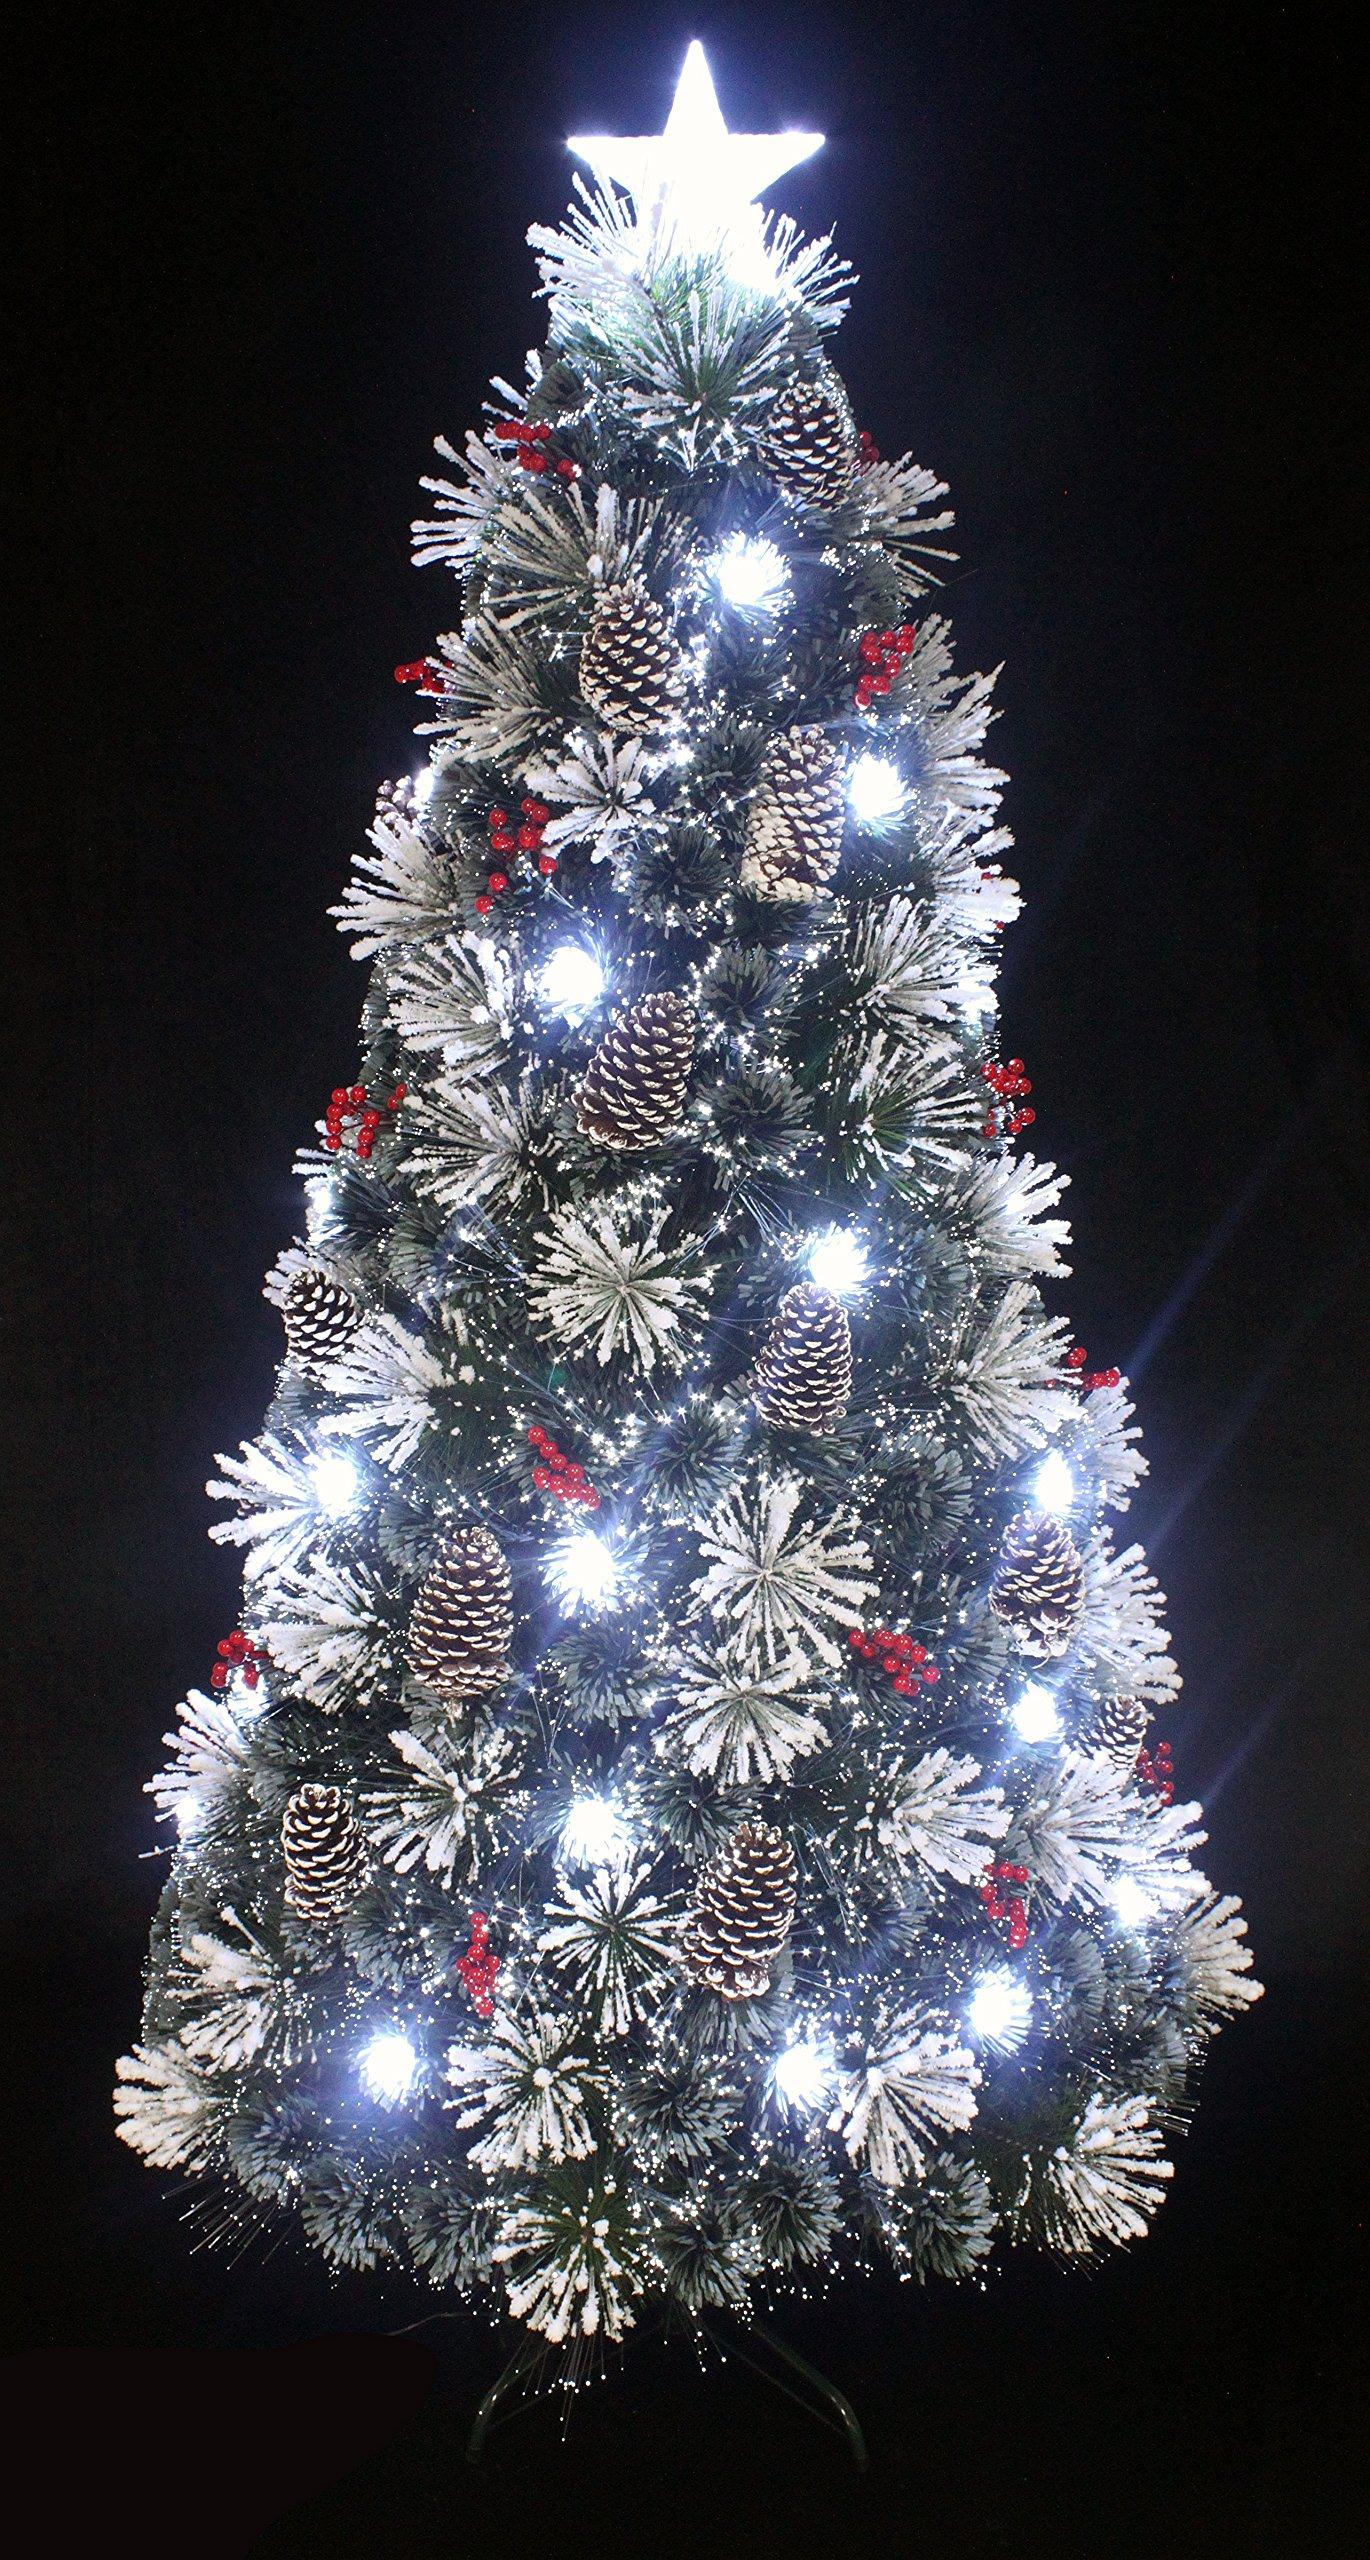 Snowy White Pine Pre-lit Flocked Christmas tree/Flocked Fiber optic Christmas tree with cool white LED light and star tree topper (3ft)